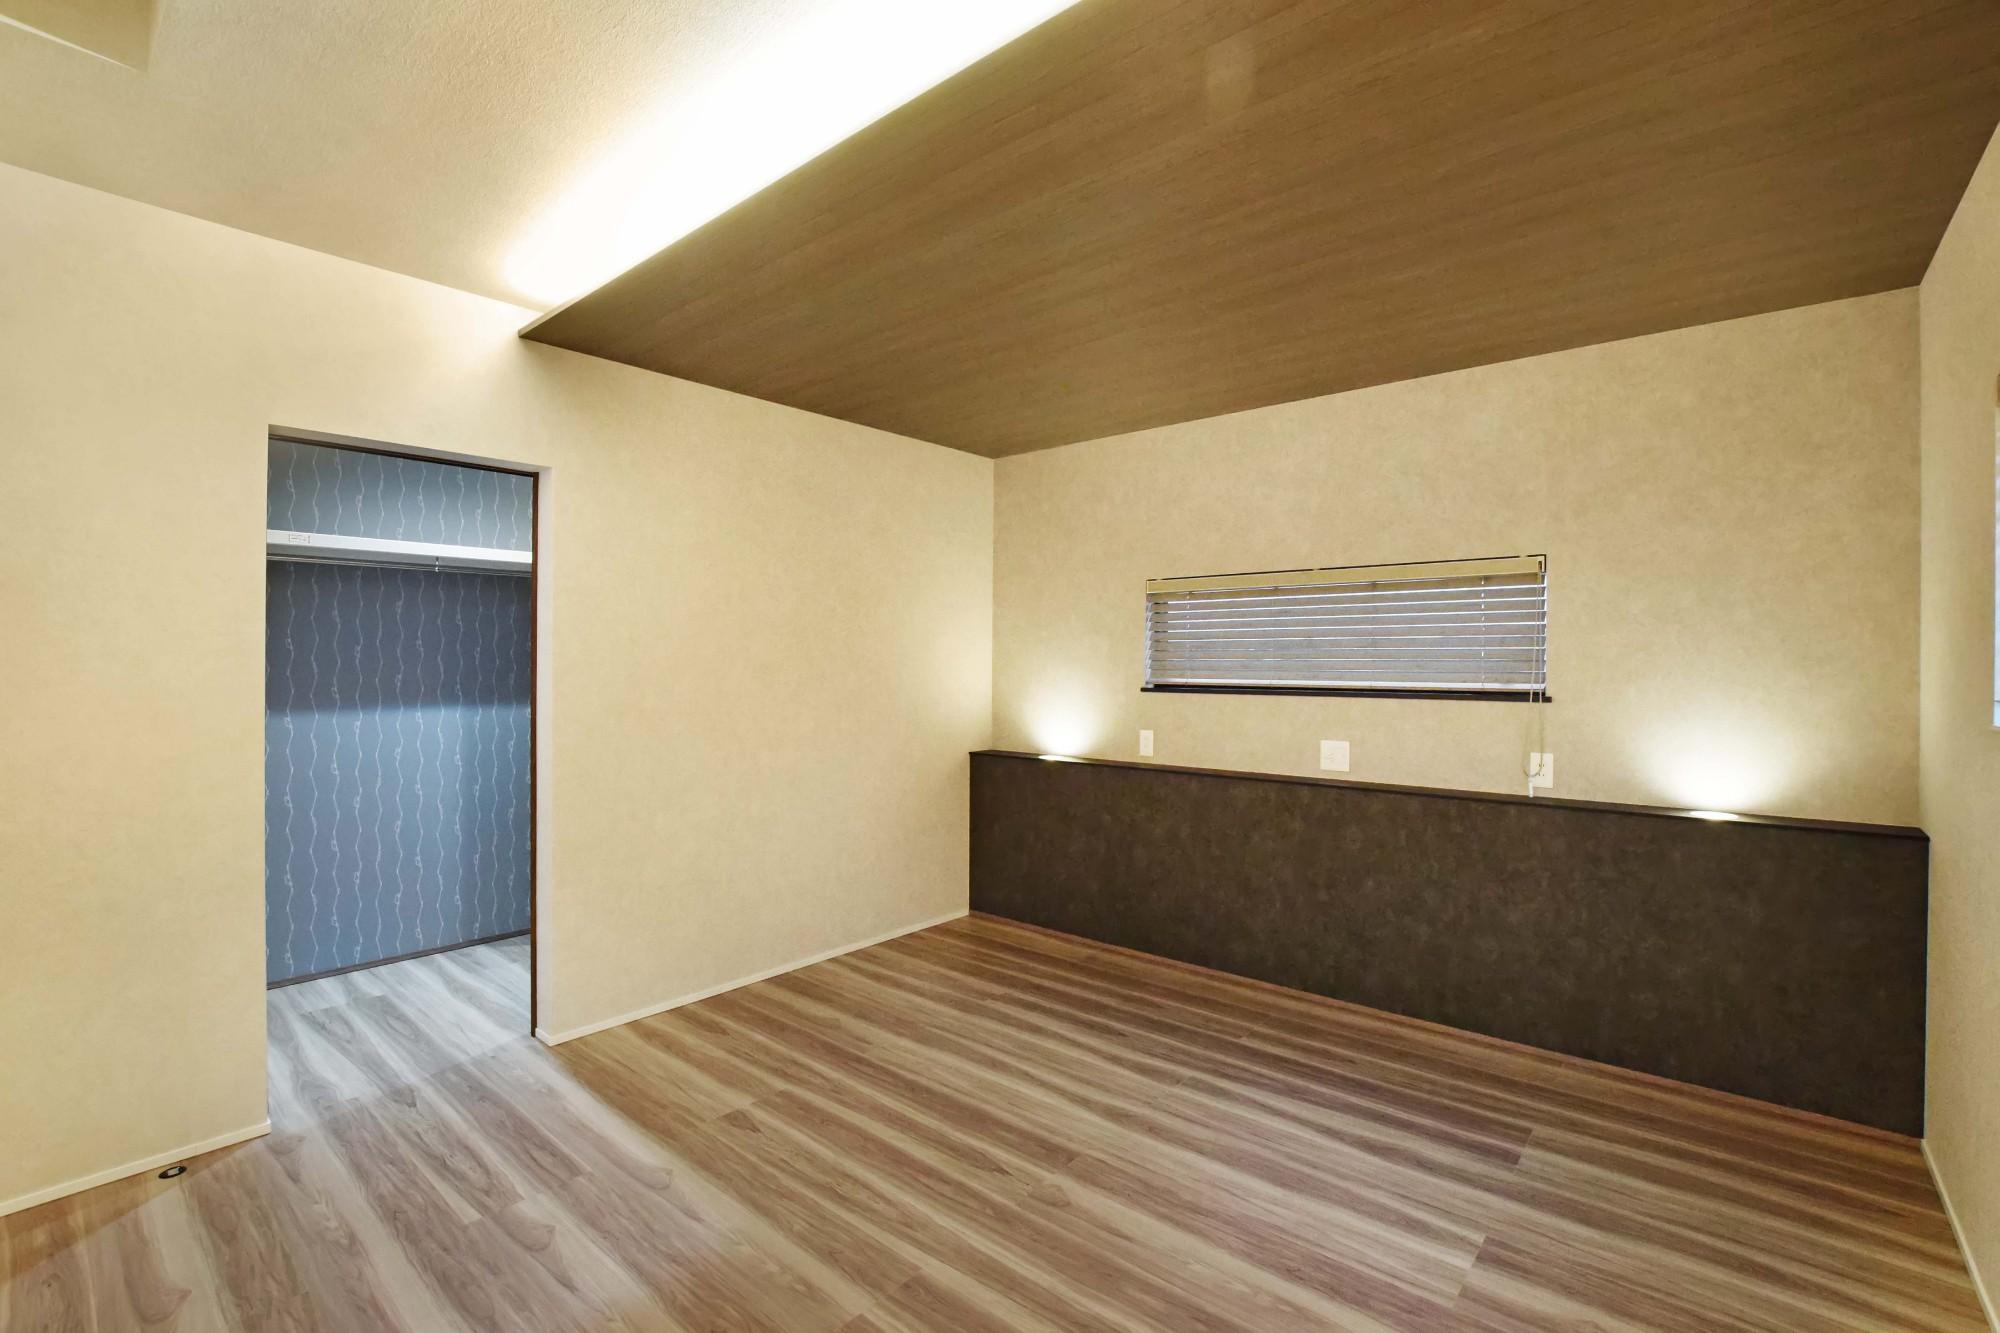 DETAIL HOME(ディテールホーム)「和と洋の溶け合う心地いい暮らし」の和風・和モダンな居室の実例写真